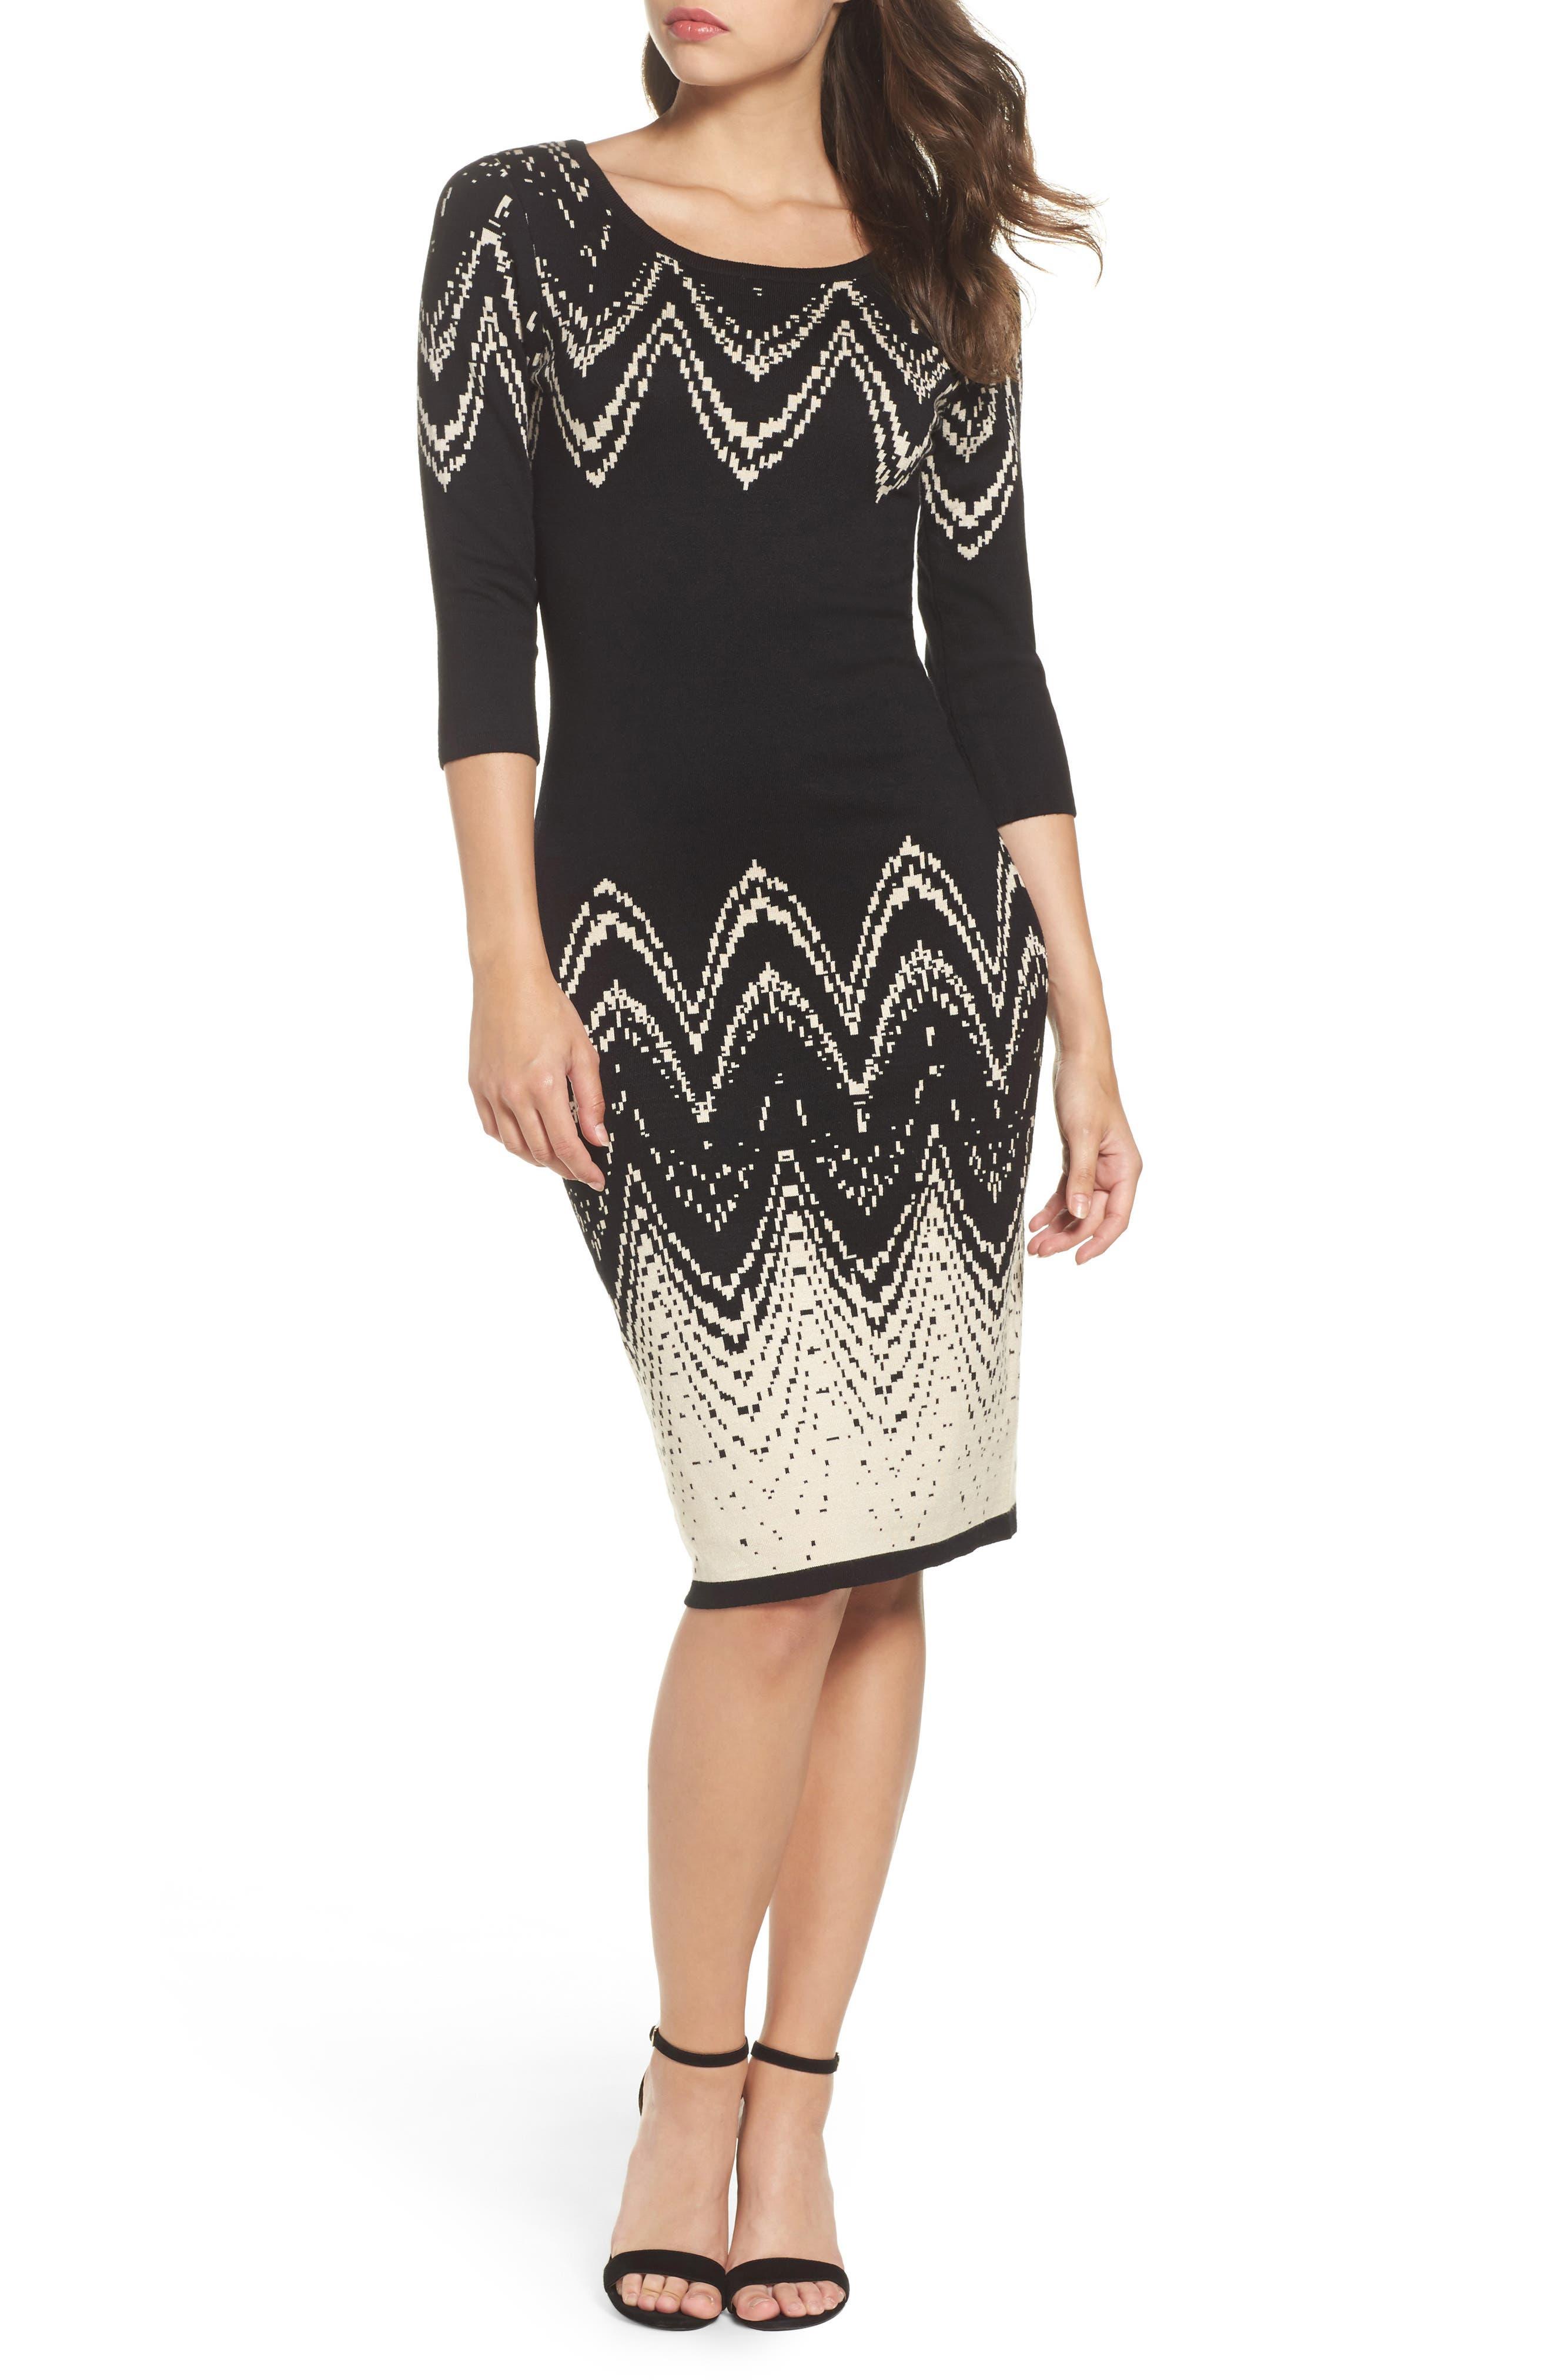 Main Image - Gabby Skye Print Sweater Dress